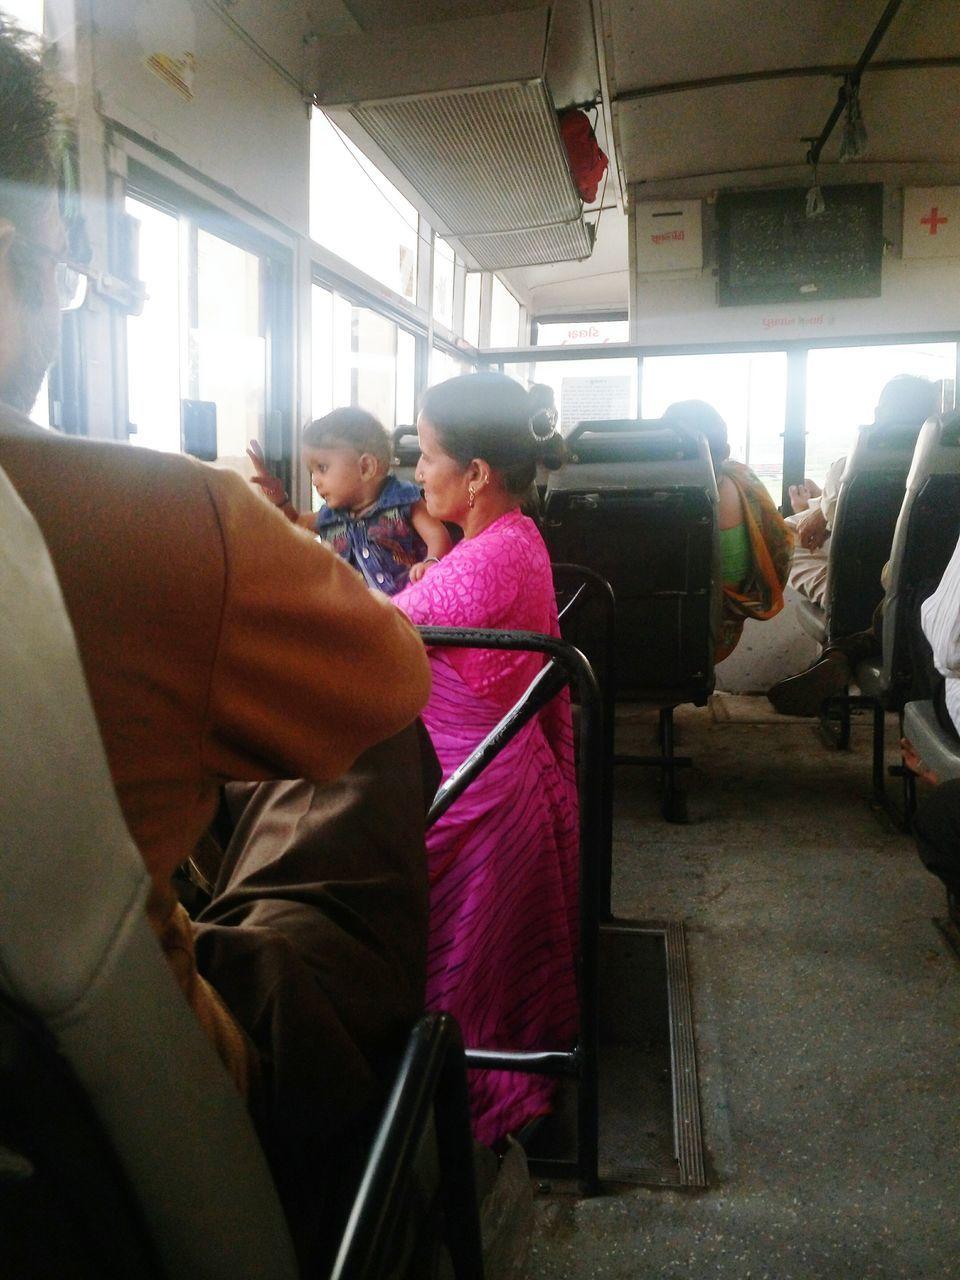 transportation, public transportation, togetherness, real people, vehicle seat, mode of transport, passenger, indoors, train - vehicle, men, day, warm clothing, people